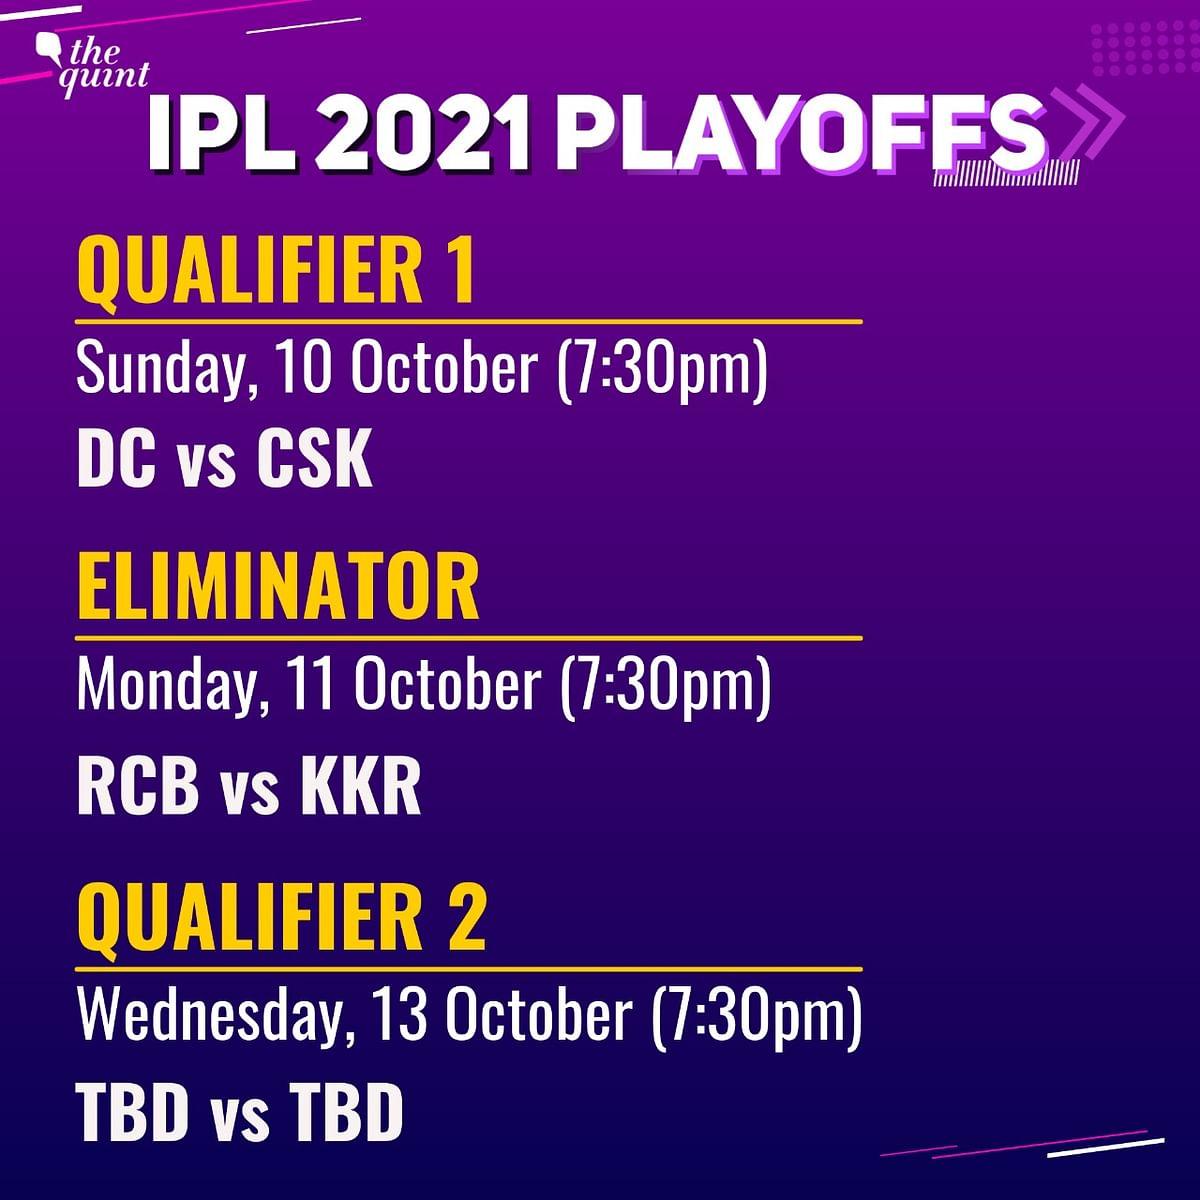 IPL 2021: Kishan & Suryakumar Brilliant But MI Knocked Out Despite Win vs SRH